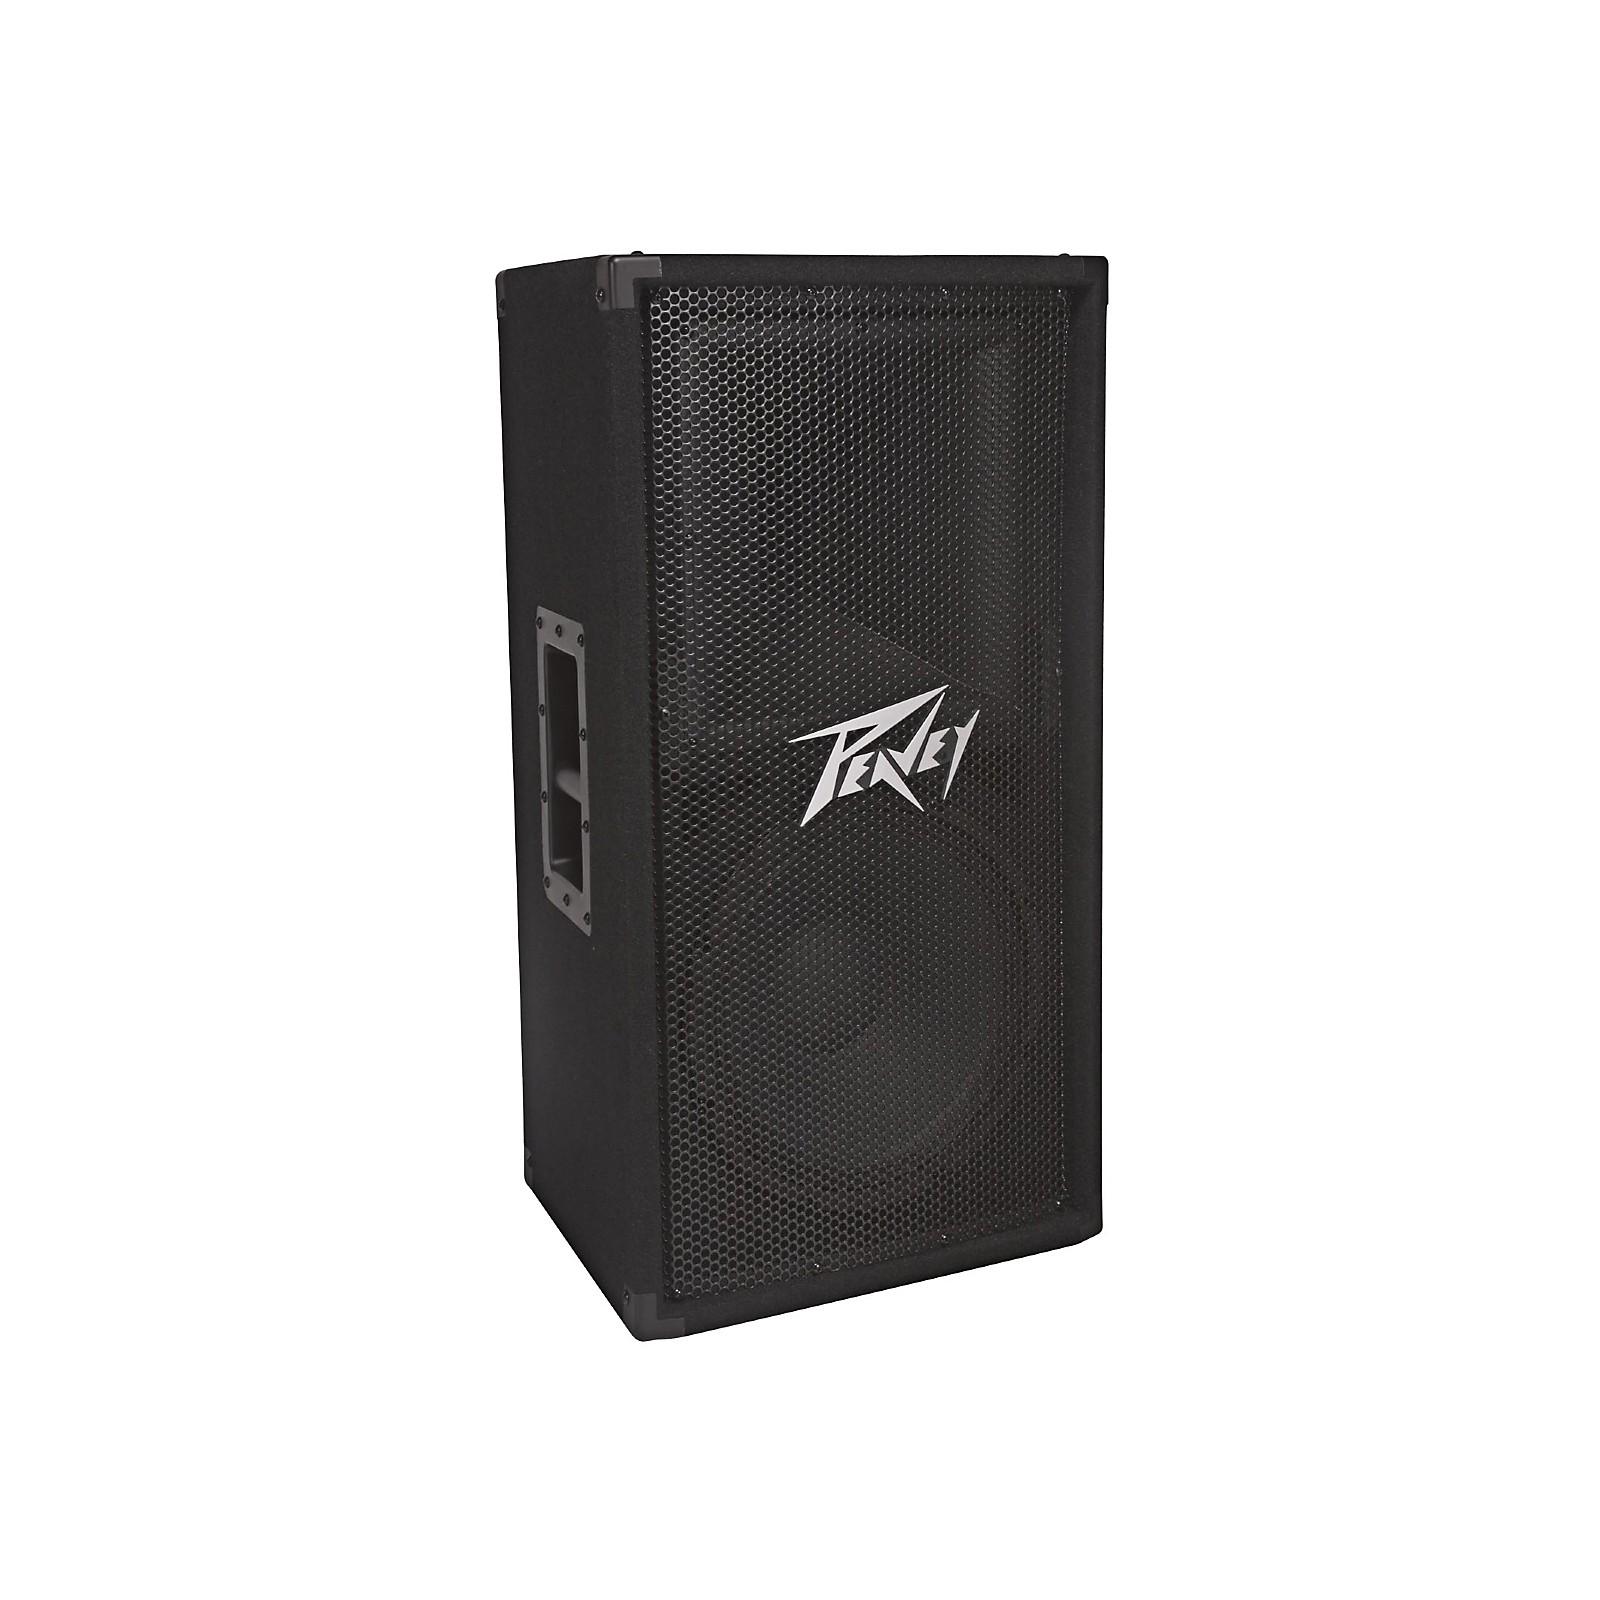 Open Box Peavey PV 112 Two-Way Speaker System